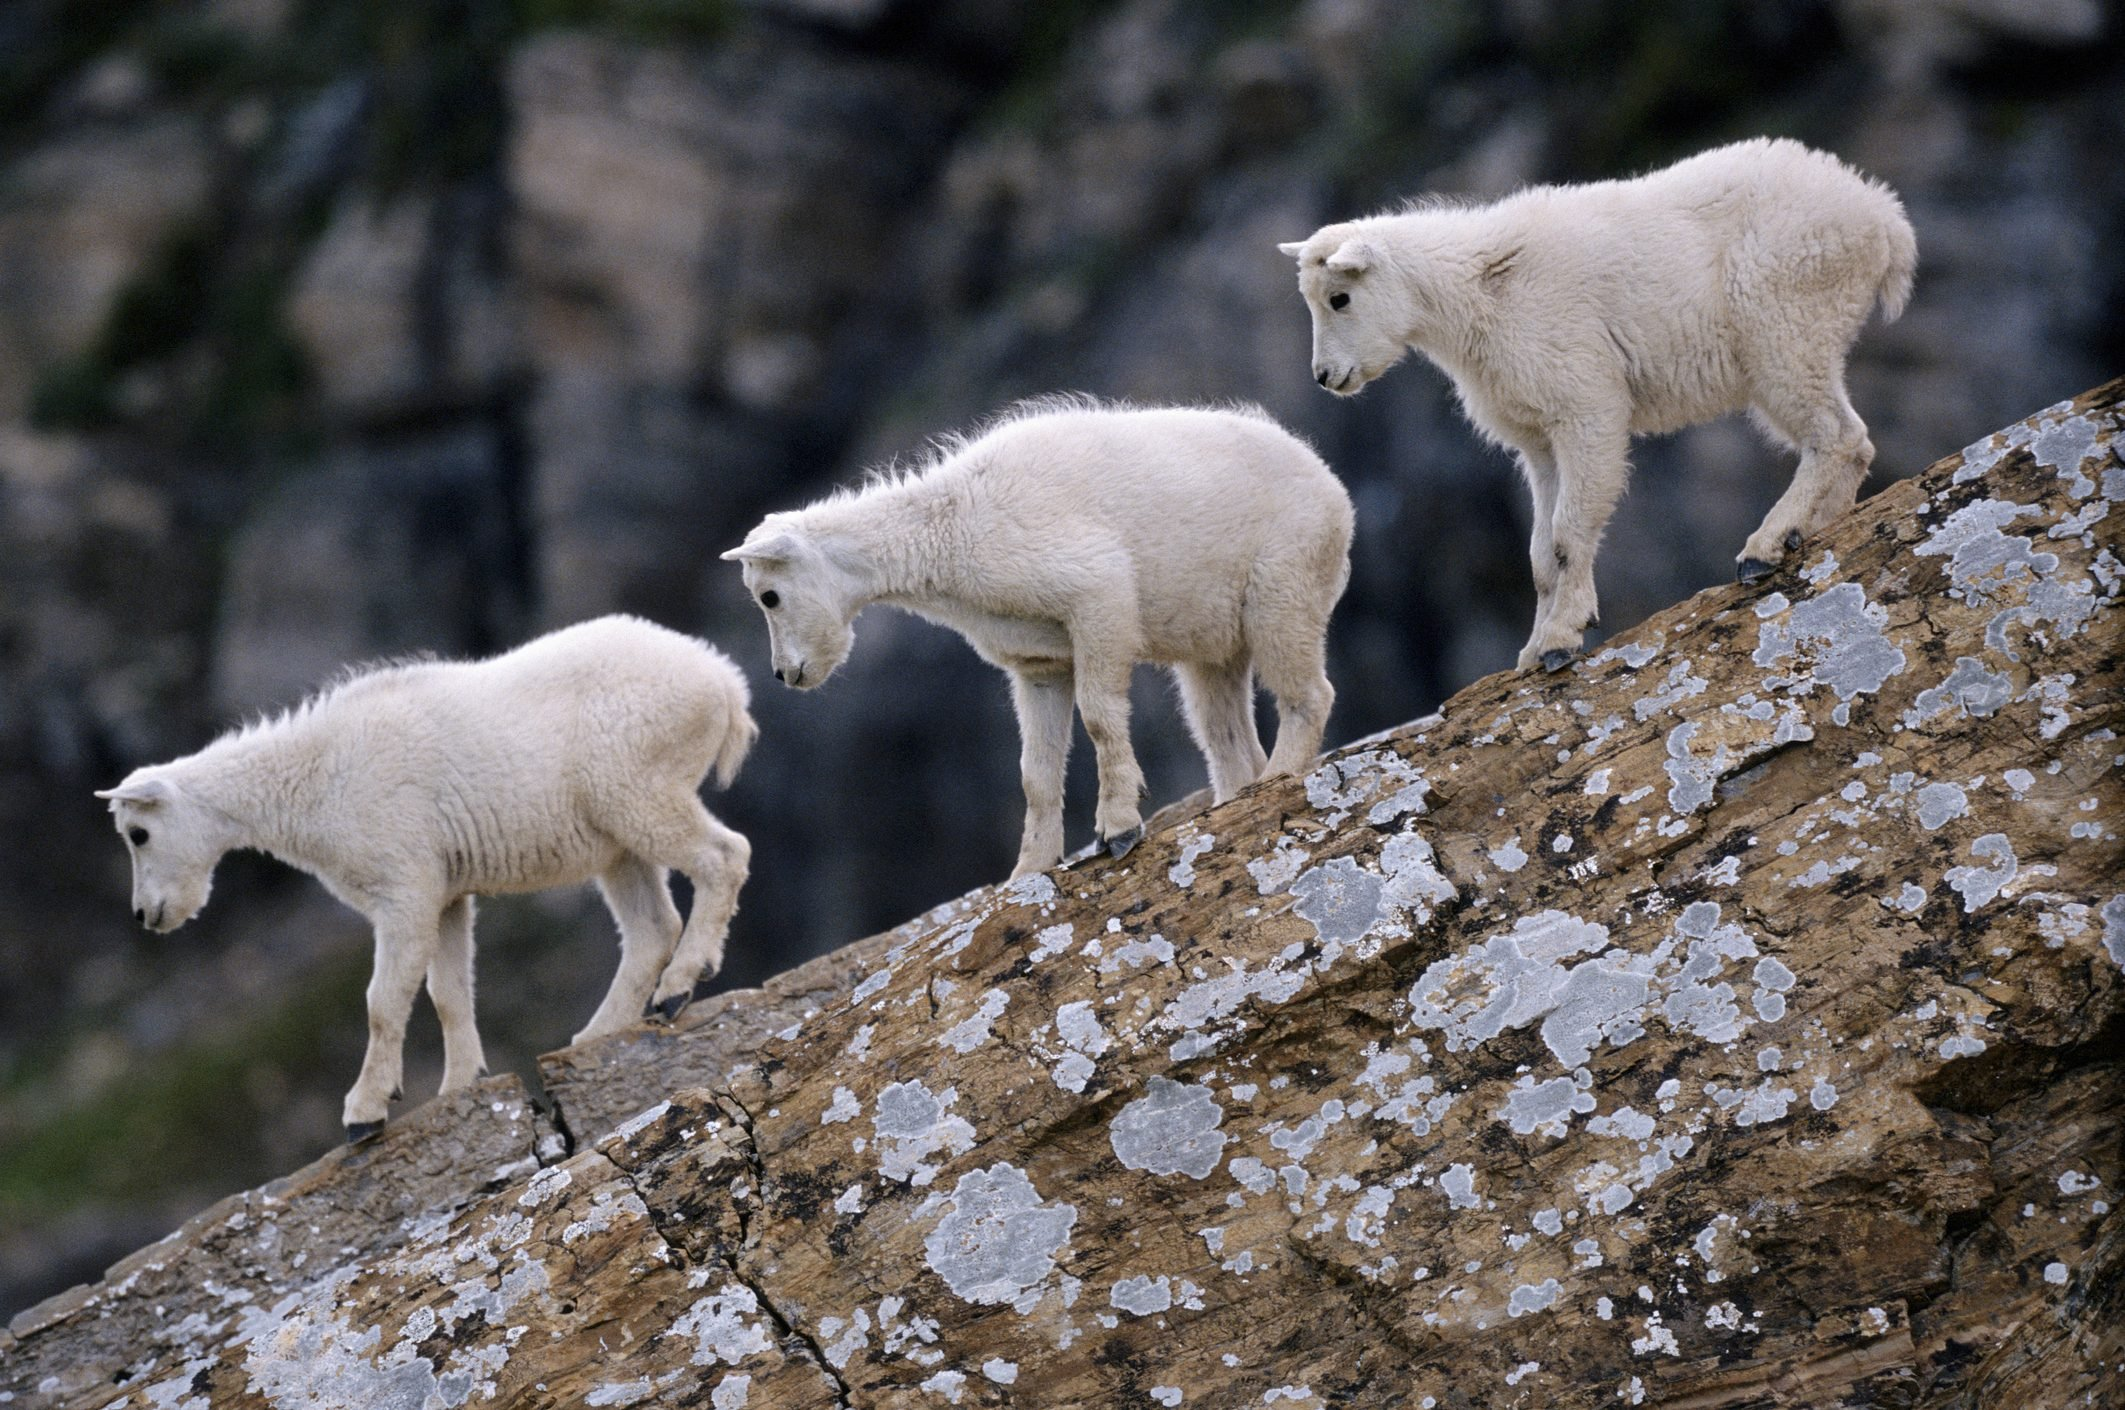 Mountain goat kids (Oreamnos americanus) on fallen wood